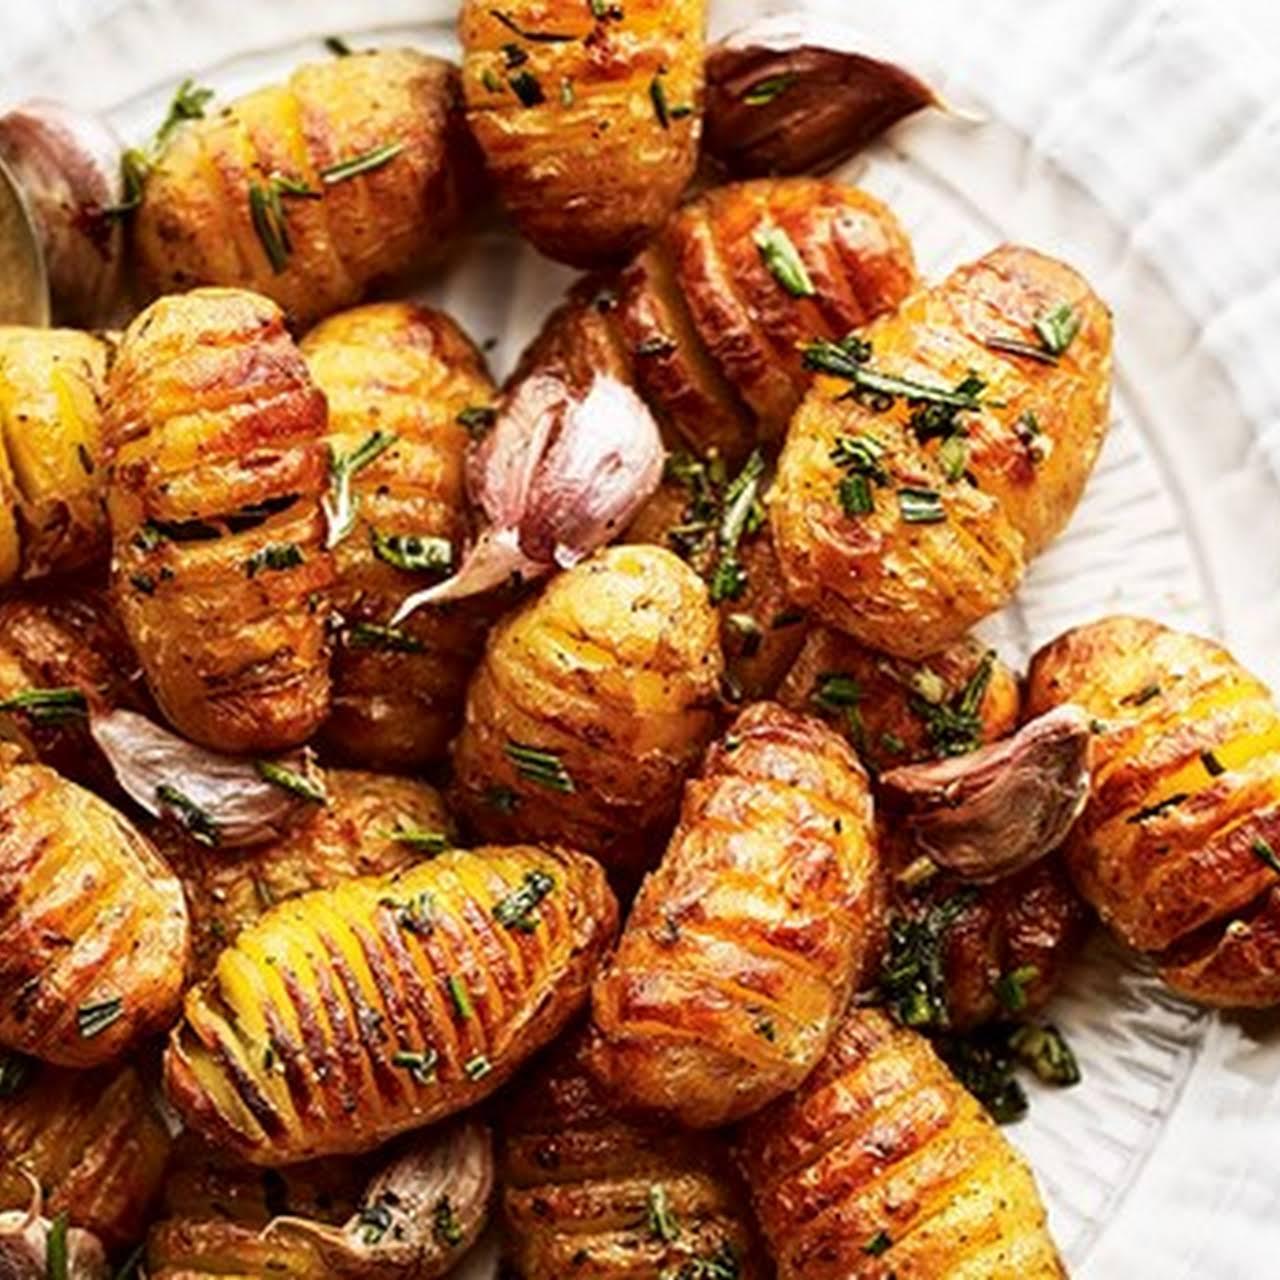 Mini Hasselback Potatoes with Rosemary and Garlic